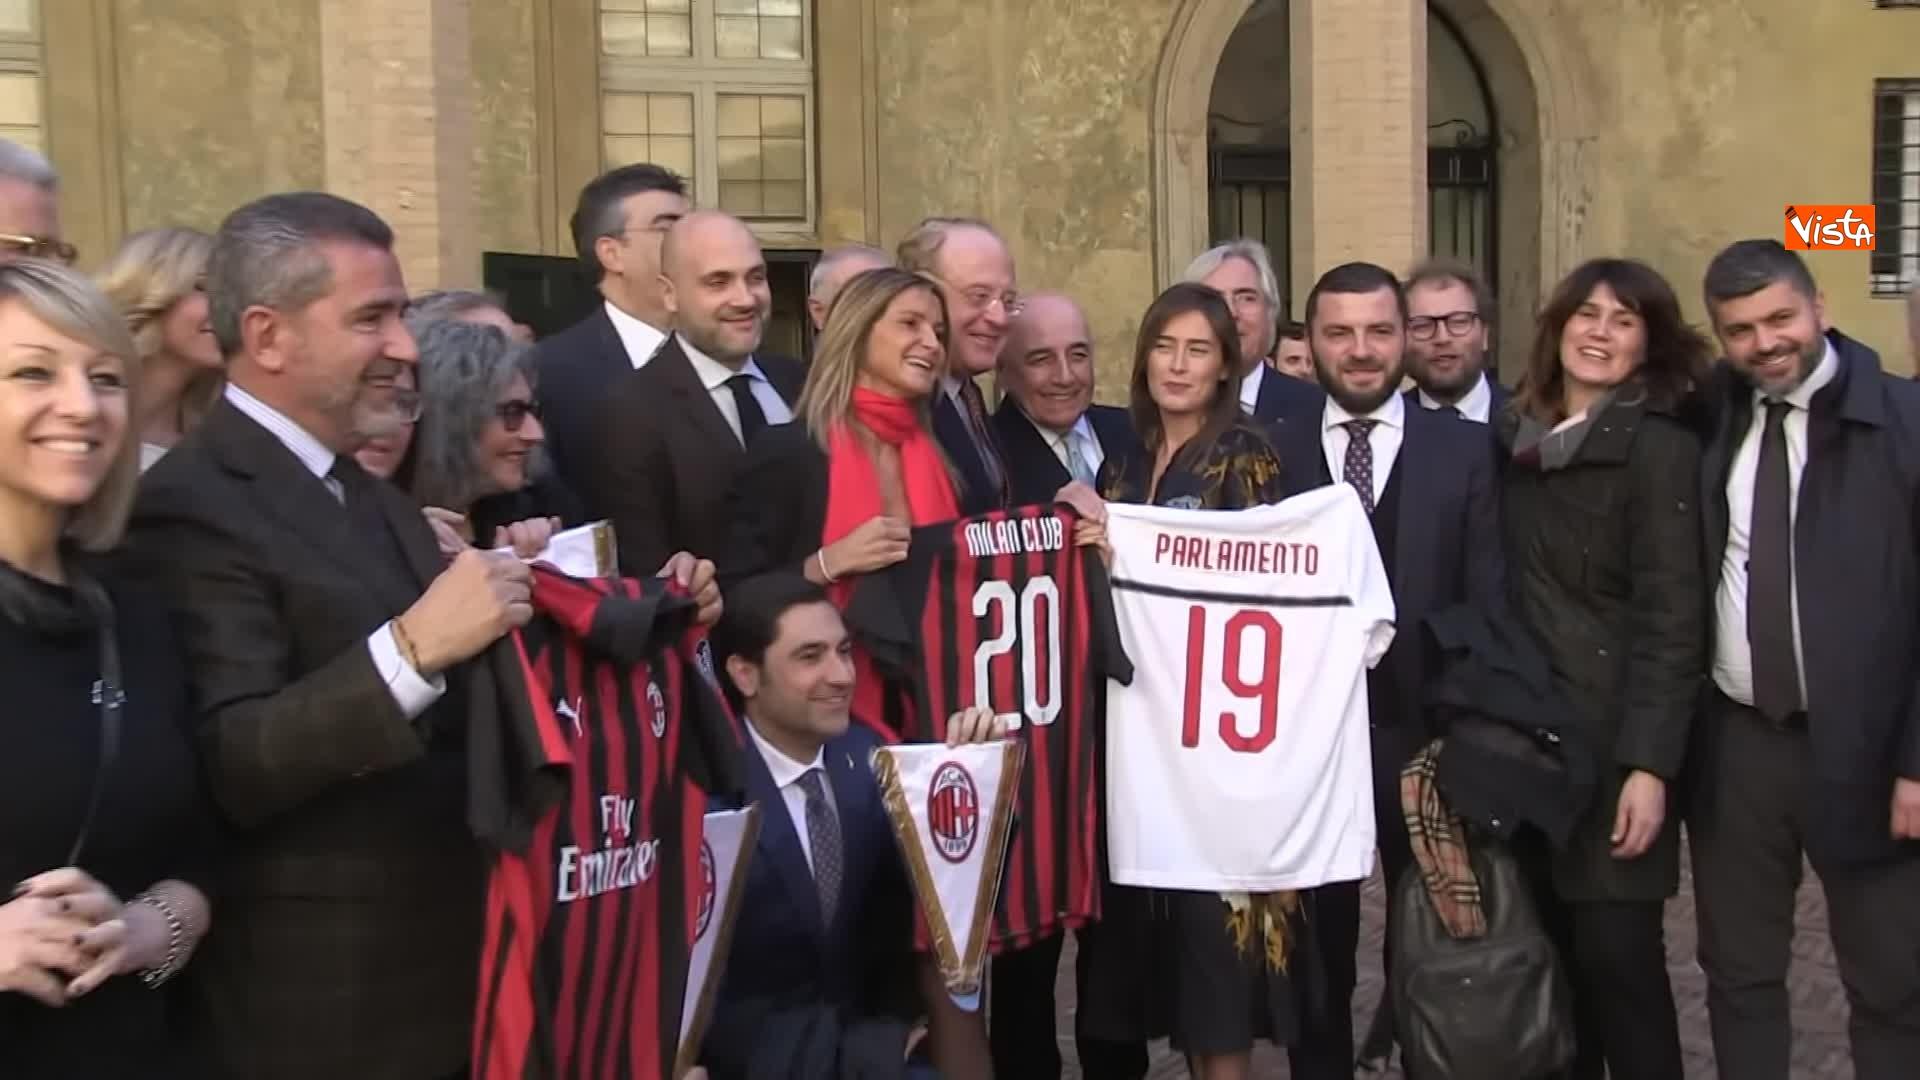 Milan Club Parlamento